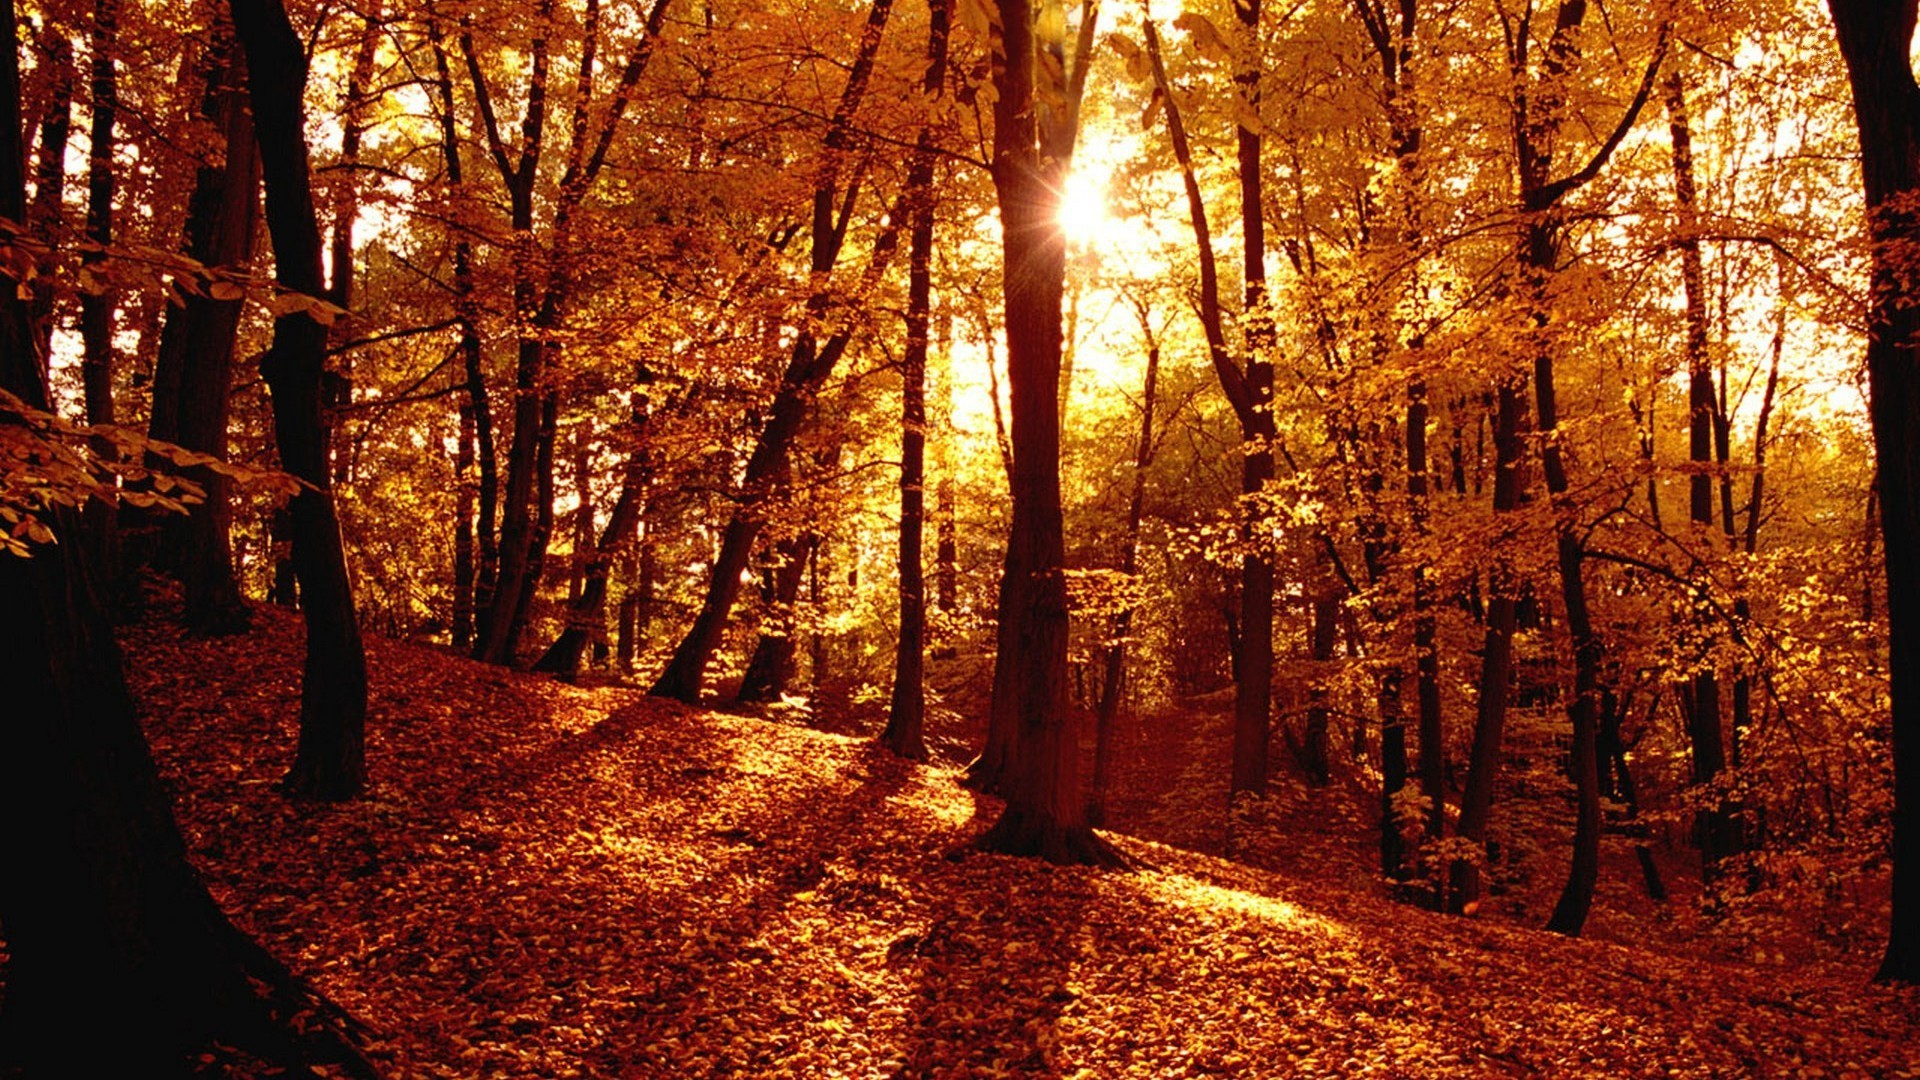 Autumn Forest Full HD Wallpaper.